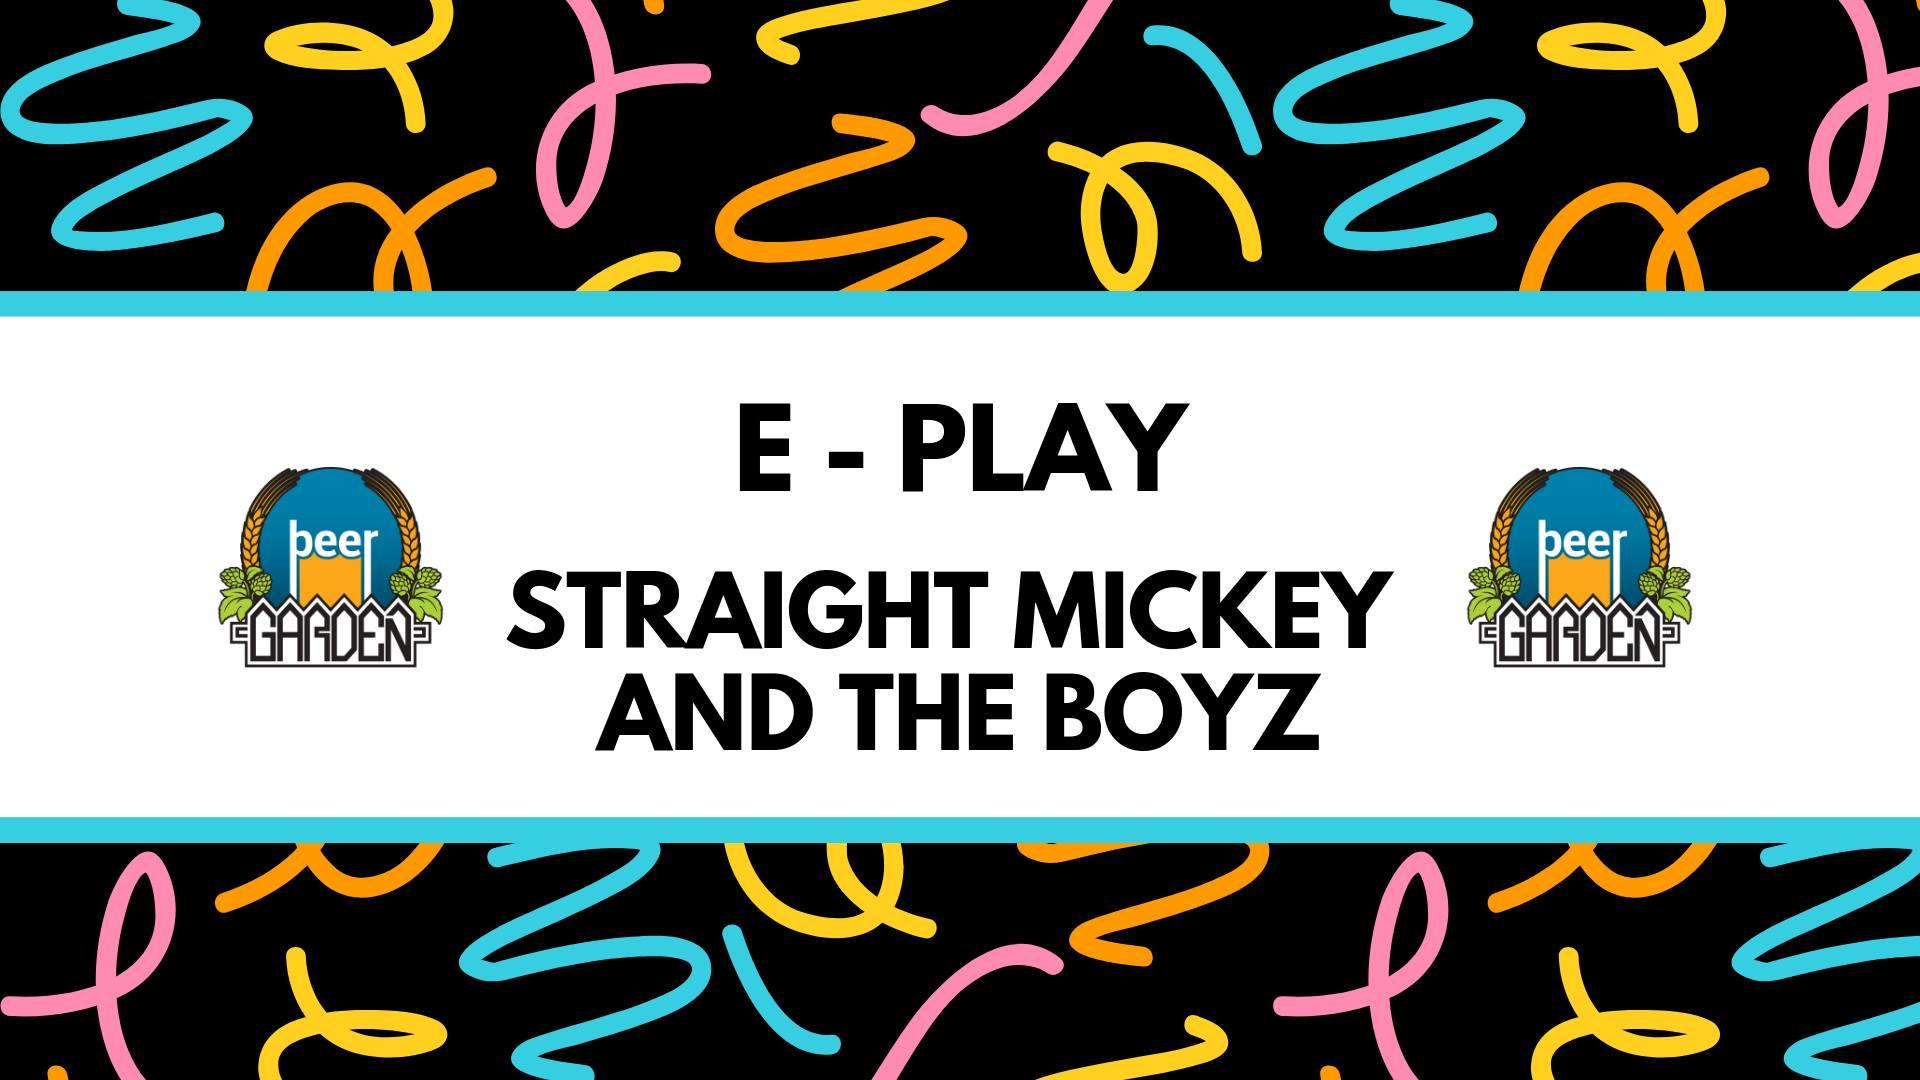 E-Play / Straight Mickey and the Boyz 19.07.2019. Beer Garden